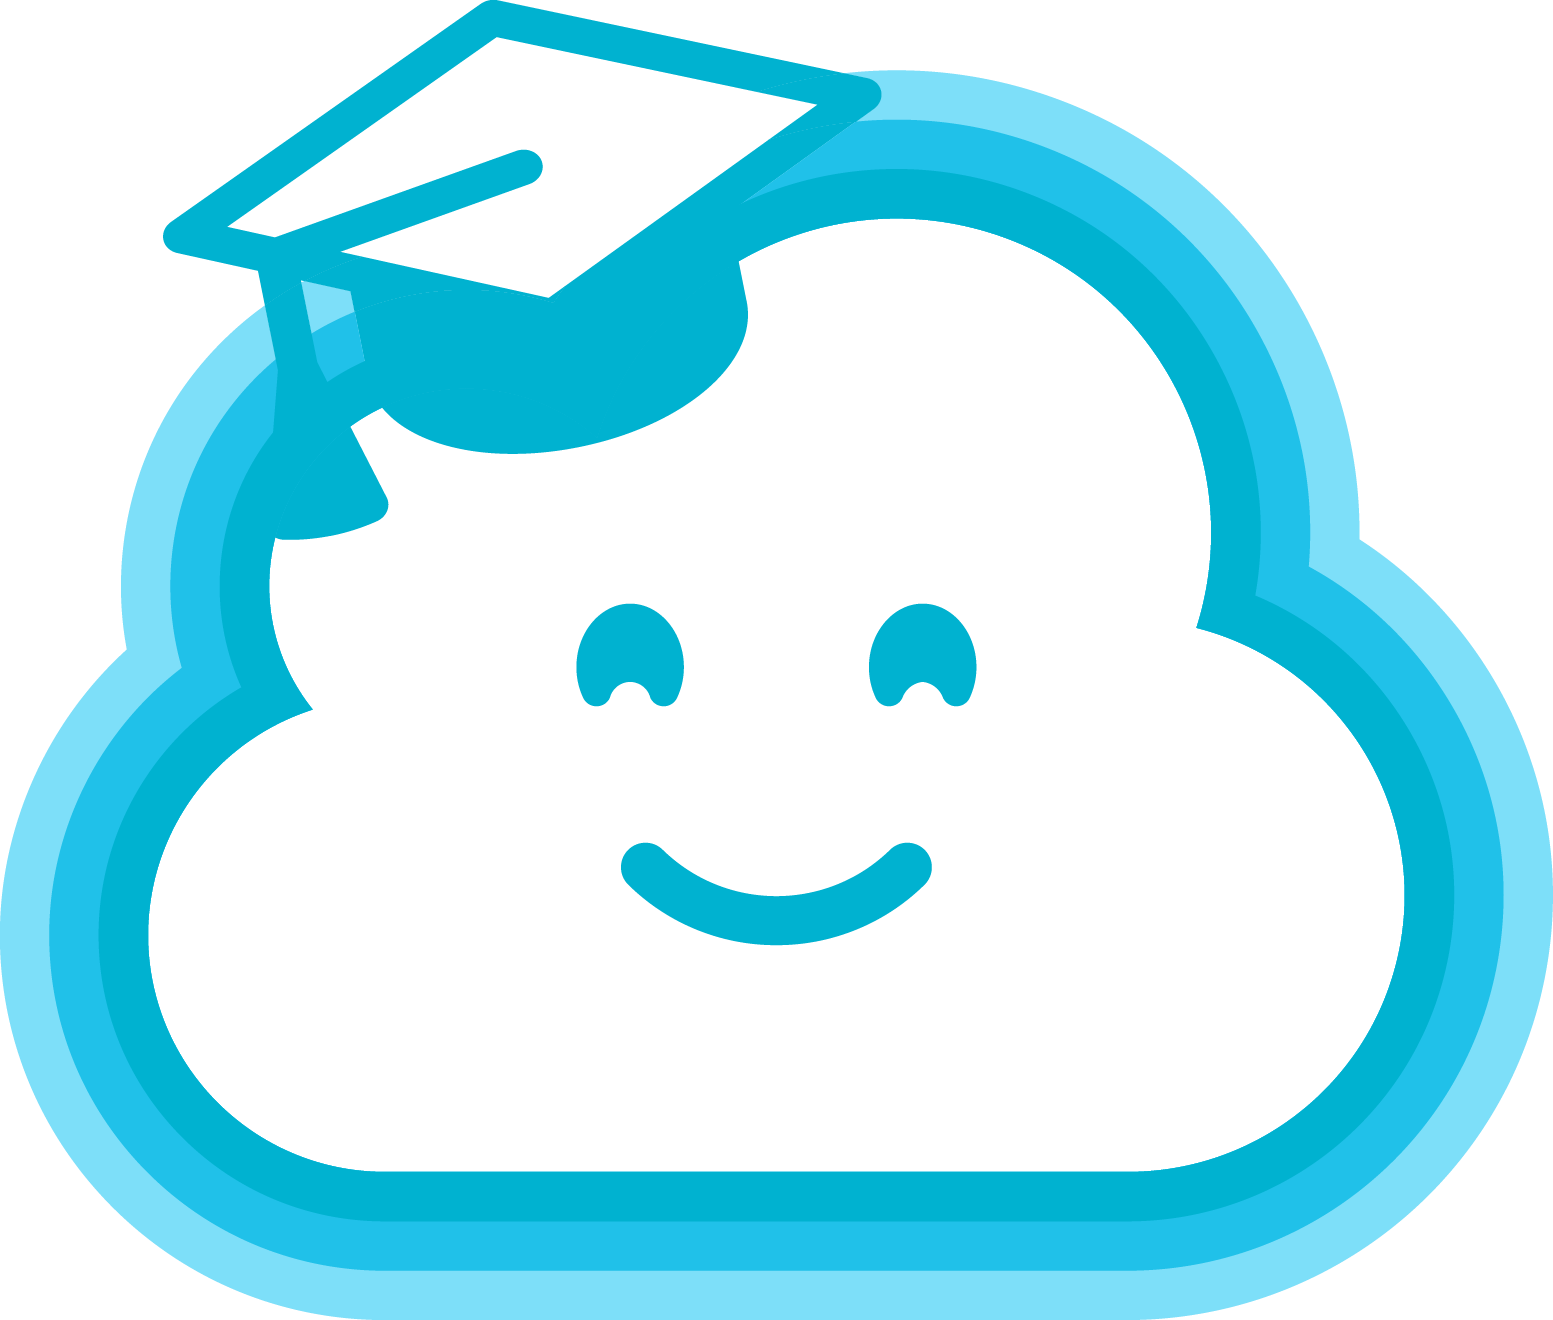 Silver-learning-animation-education-logo